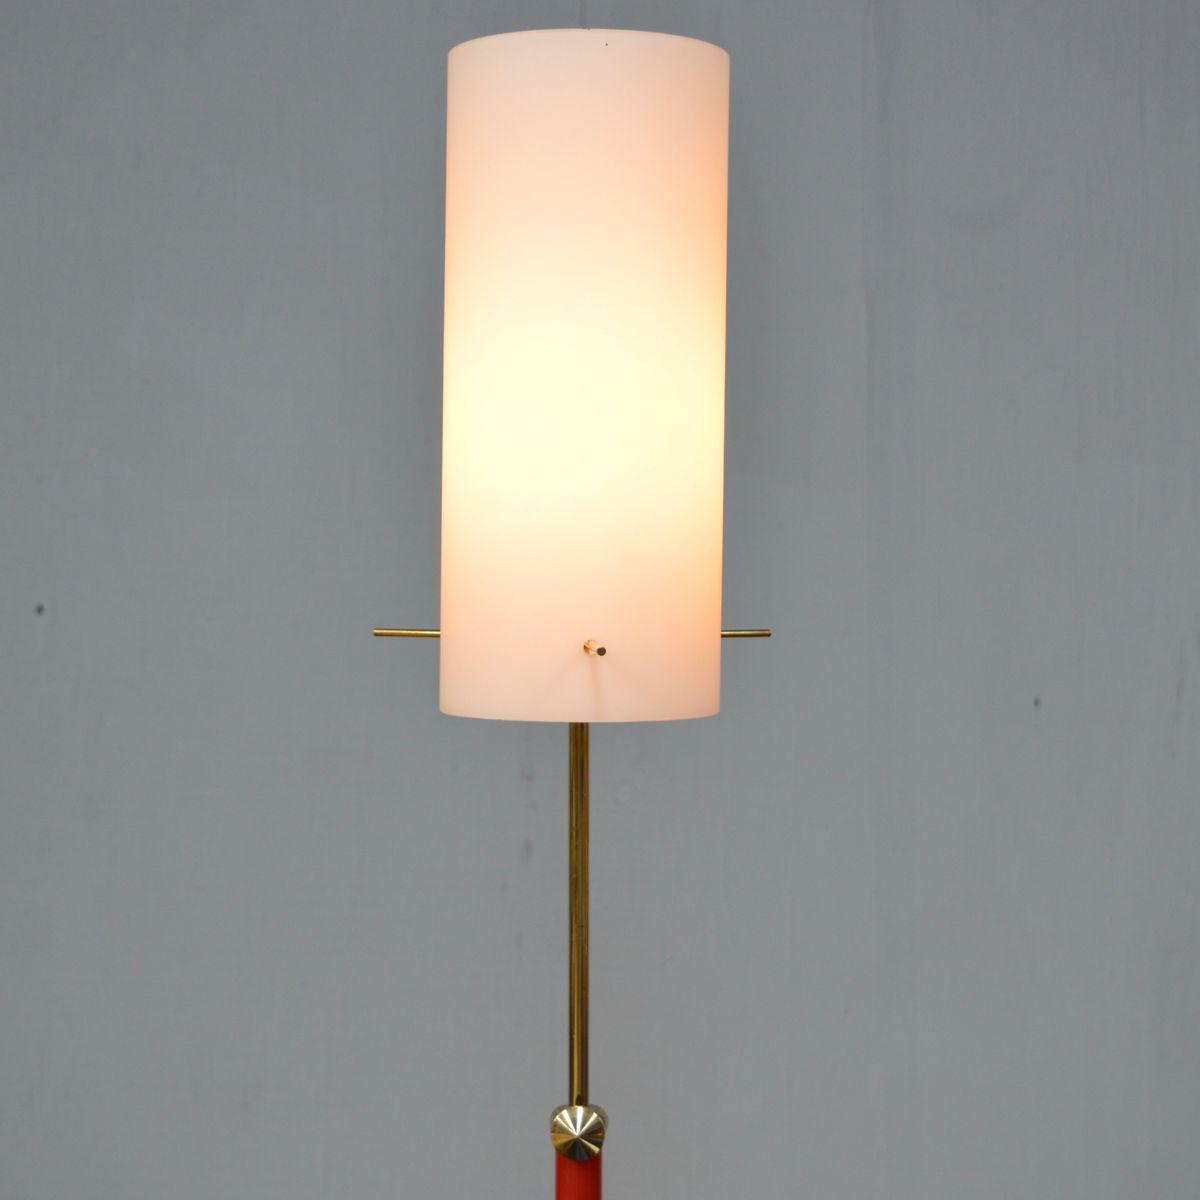 Italian opaline floor lamp 1950s for sale at pamono for 1950s floor lamps